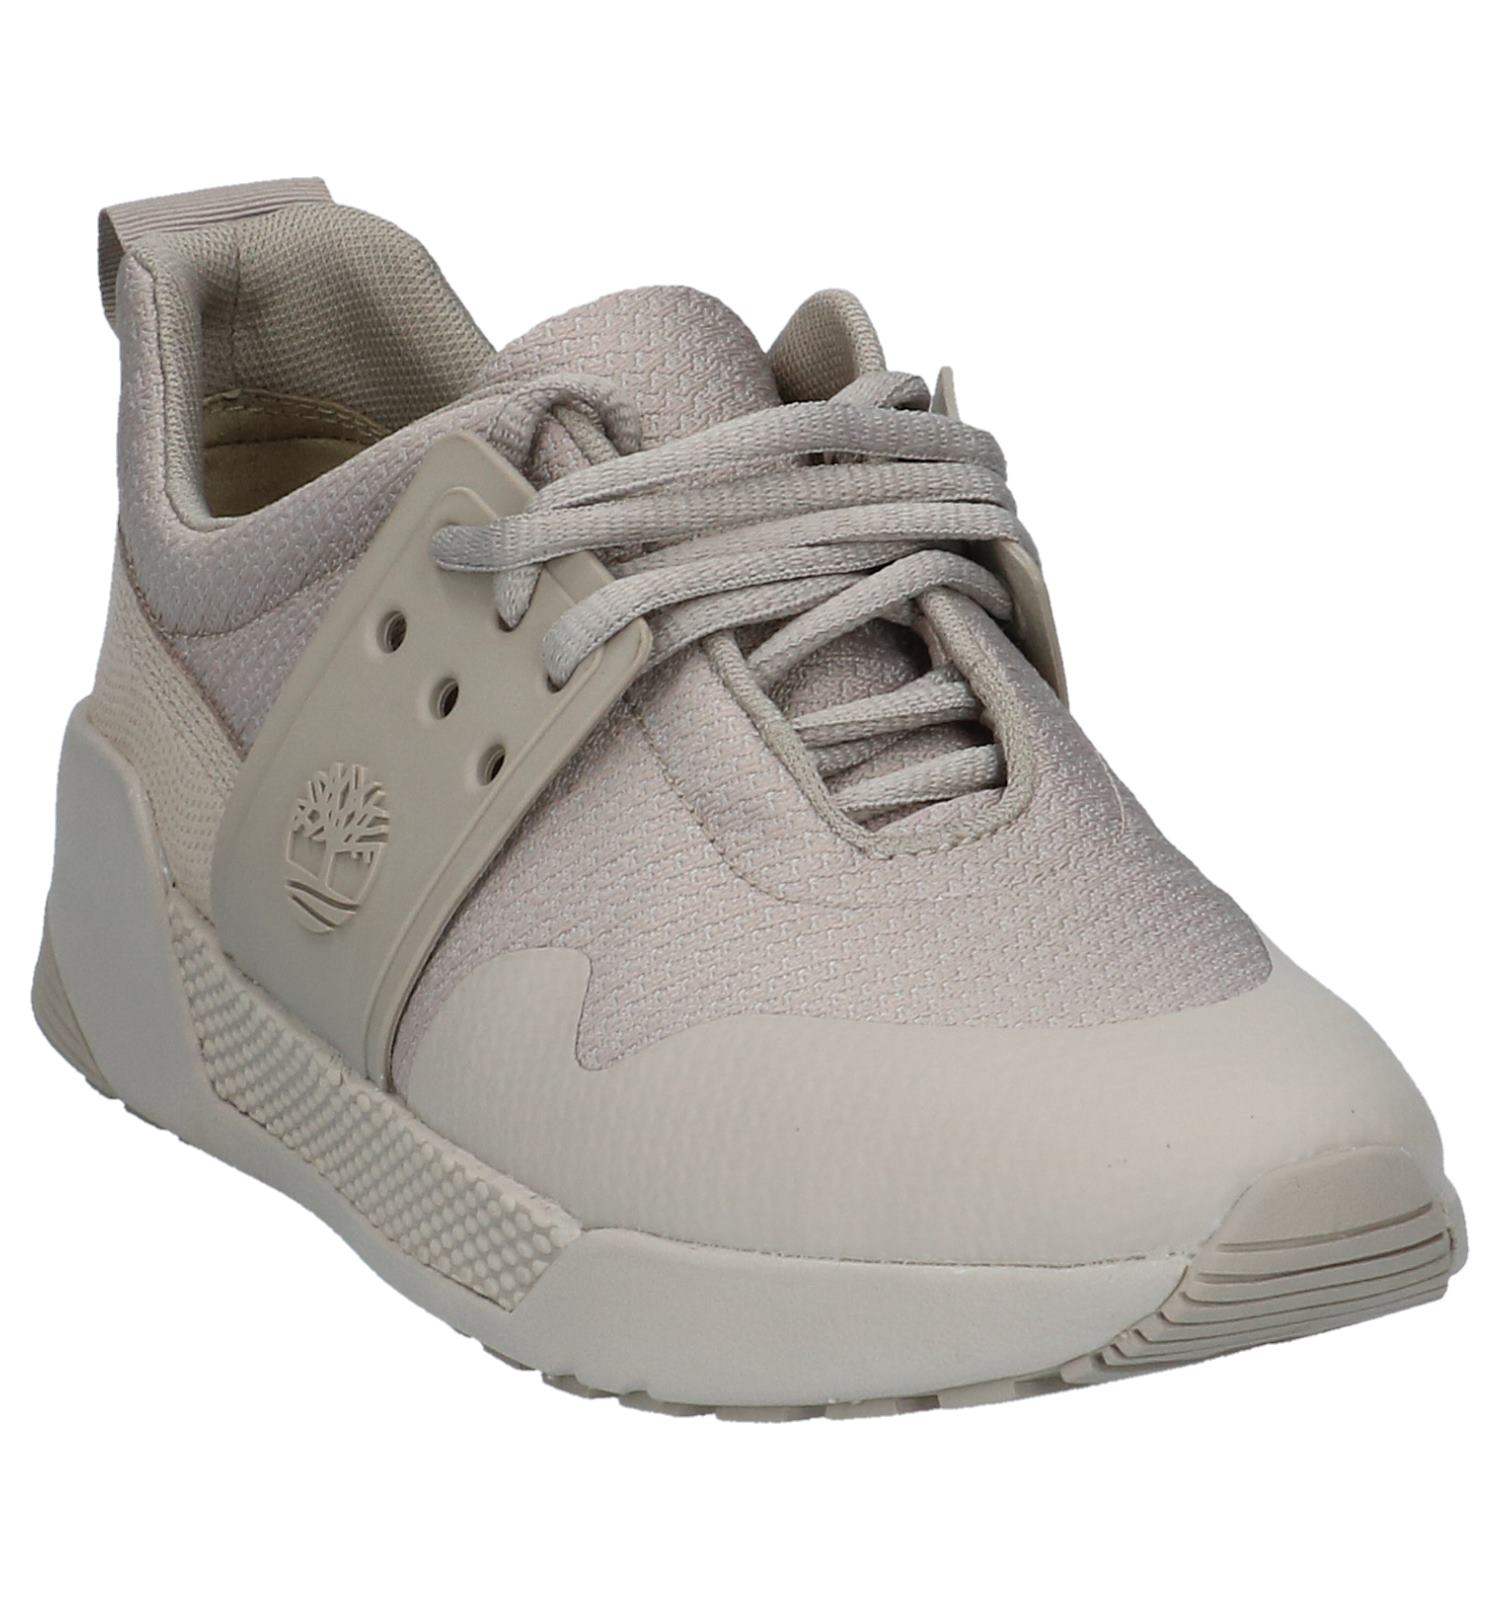 Geklede Knit Lage Timberland Sneakers Taupe Kiri Up Jl1cTFK3